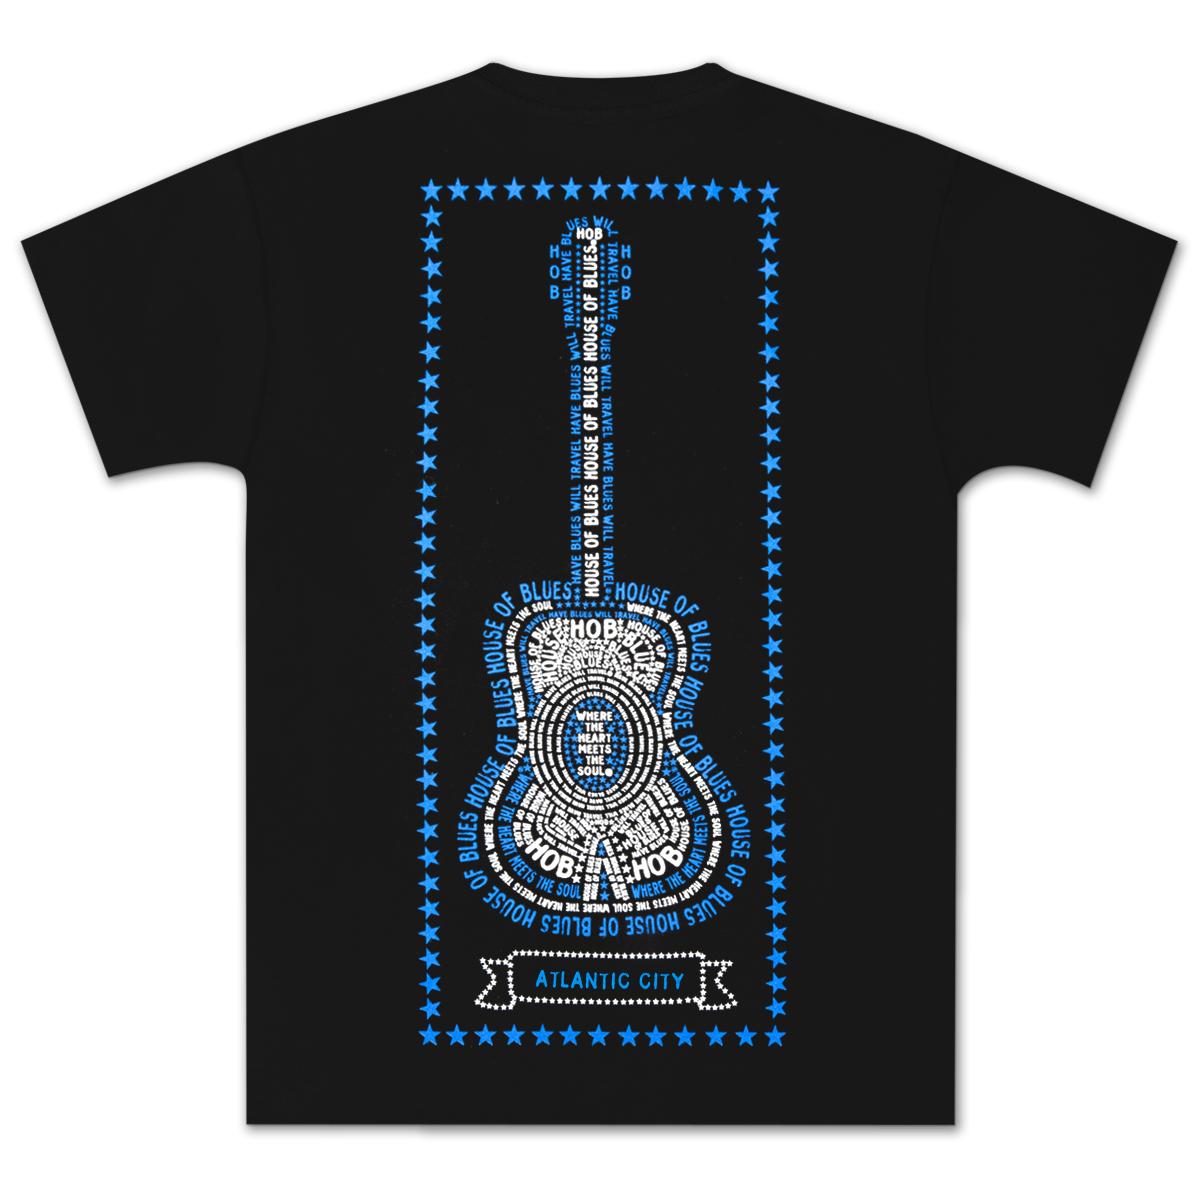 House of Blues Star Guitar T-Shirt - Atlantic City